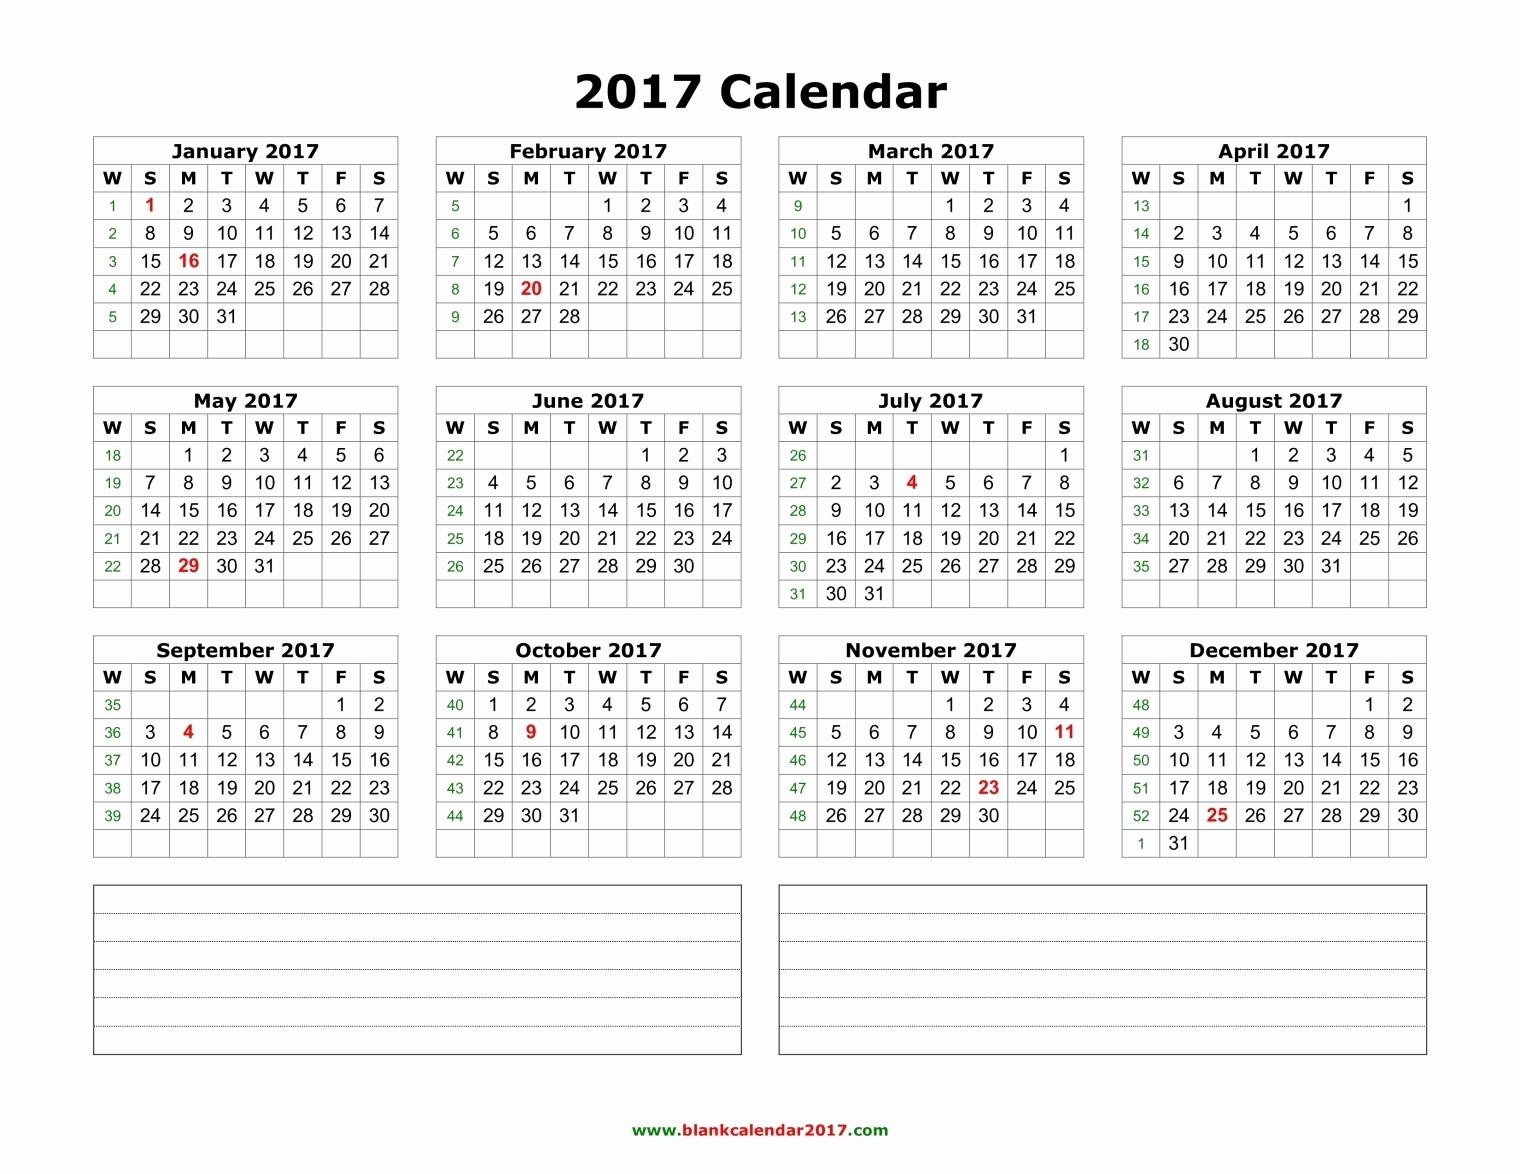 2017 Editable Calendar with Holidays Best Of Calendar 2017 50 Important Calendar Templates Of 2017